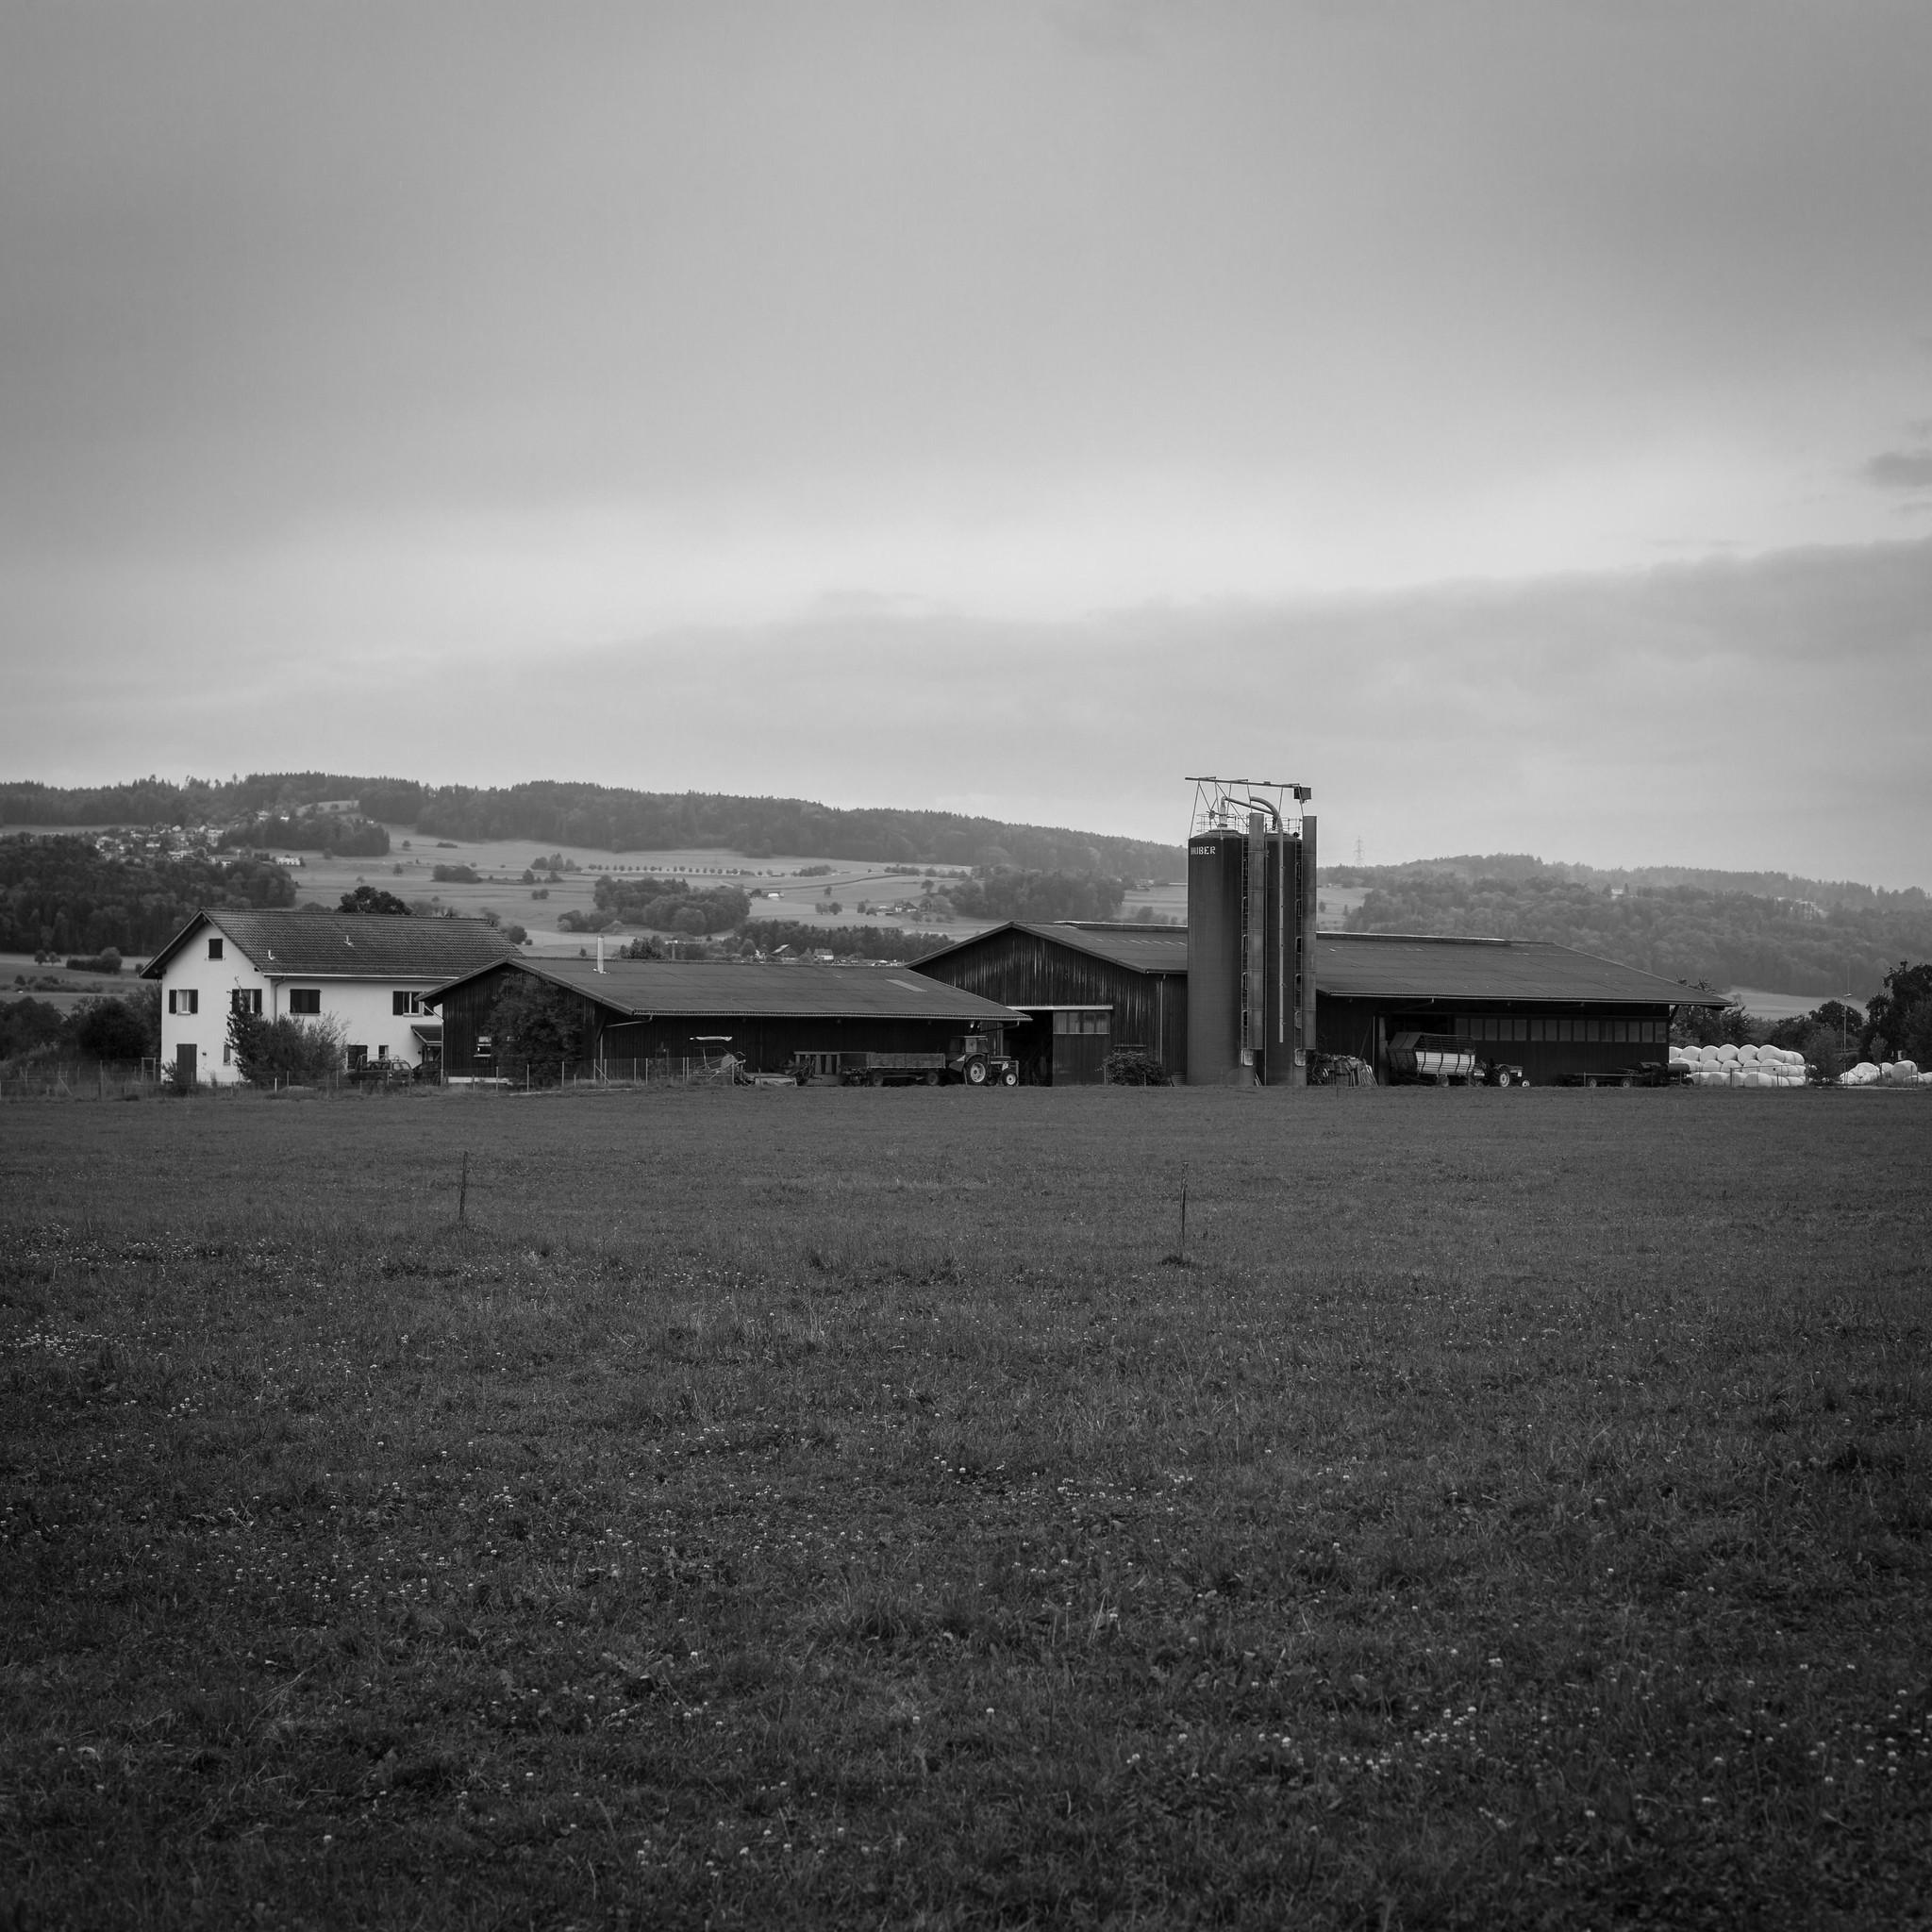 Uster Farm